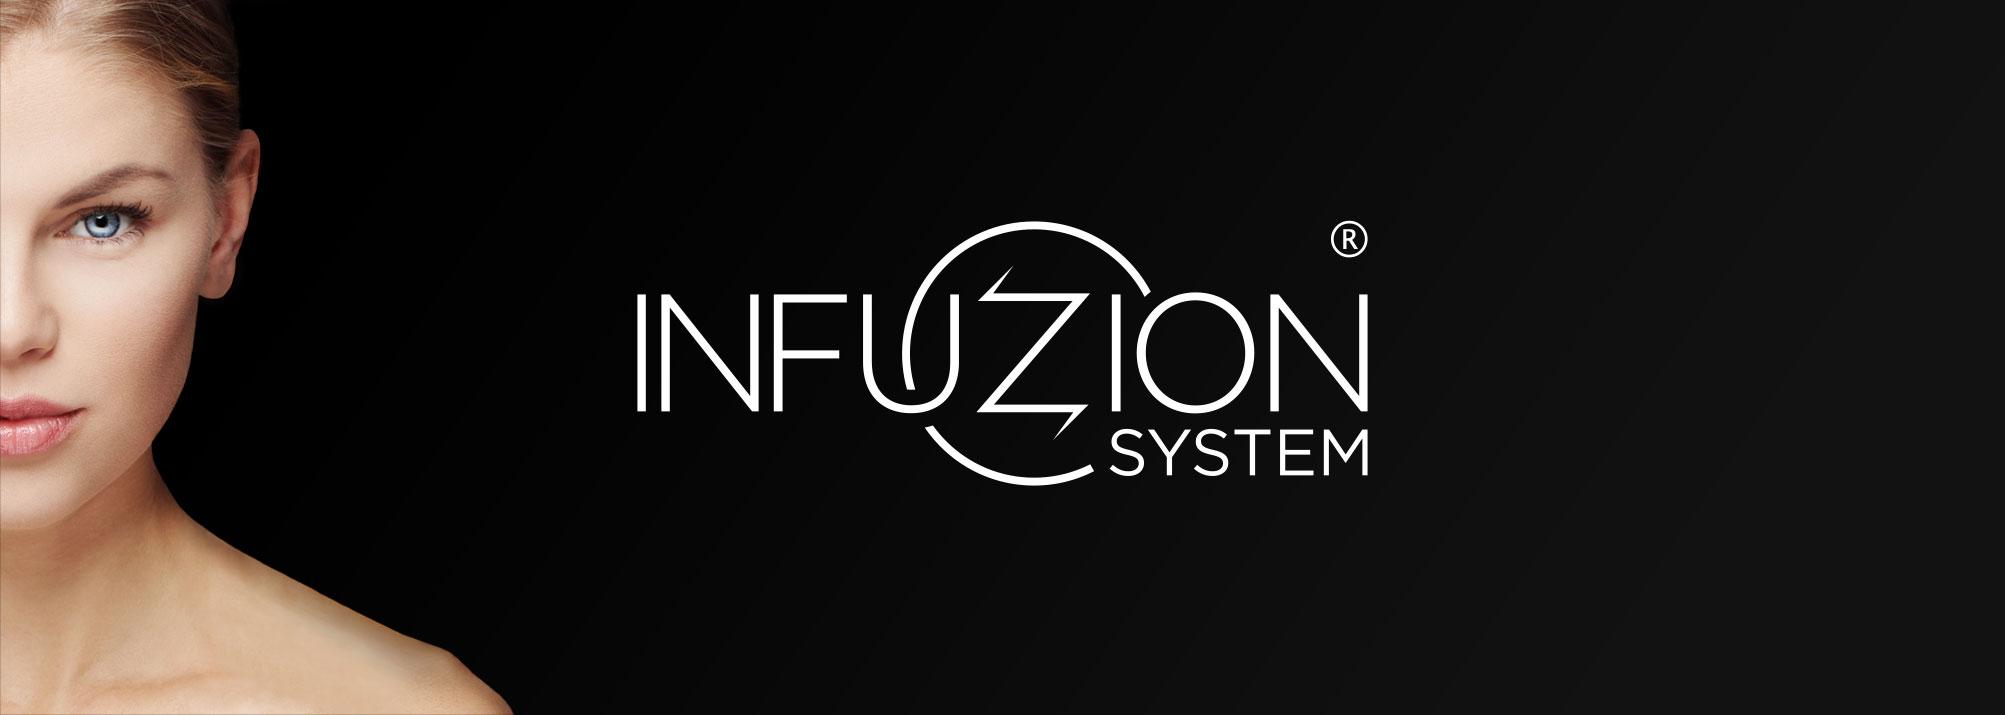 INFUZION System